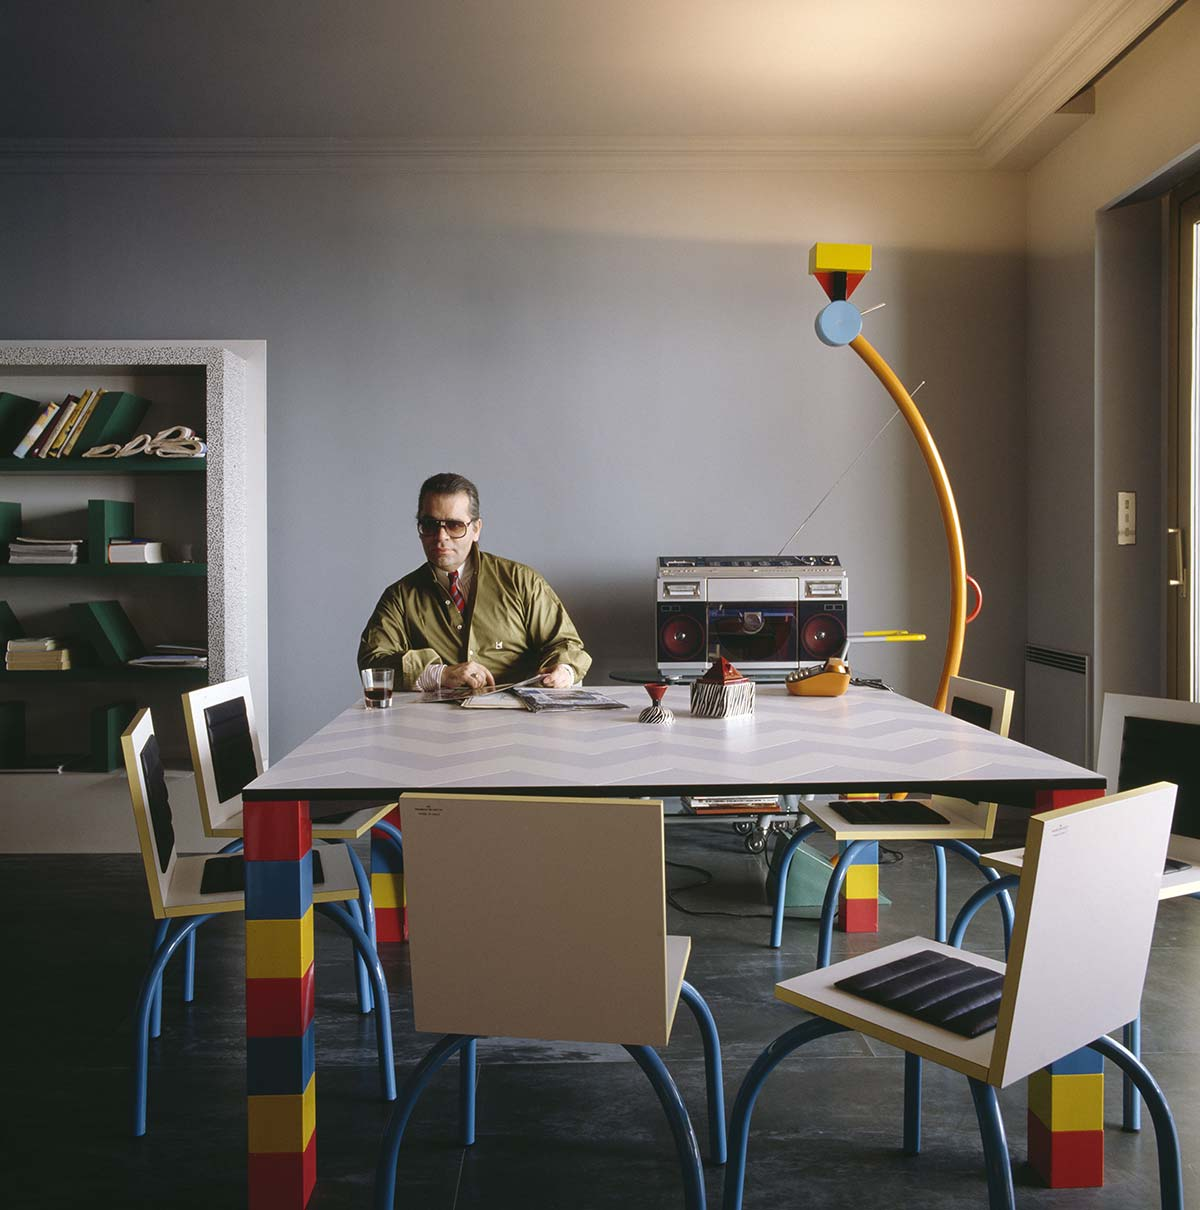 Karl Lagerfeld - Memphis, Vitra Design Museum - Photo © Jacques Schumacher, VG Bild-Kunst, Bonn 2021 for all designs by Ettore Sottsass